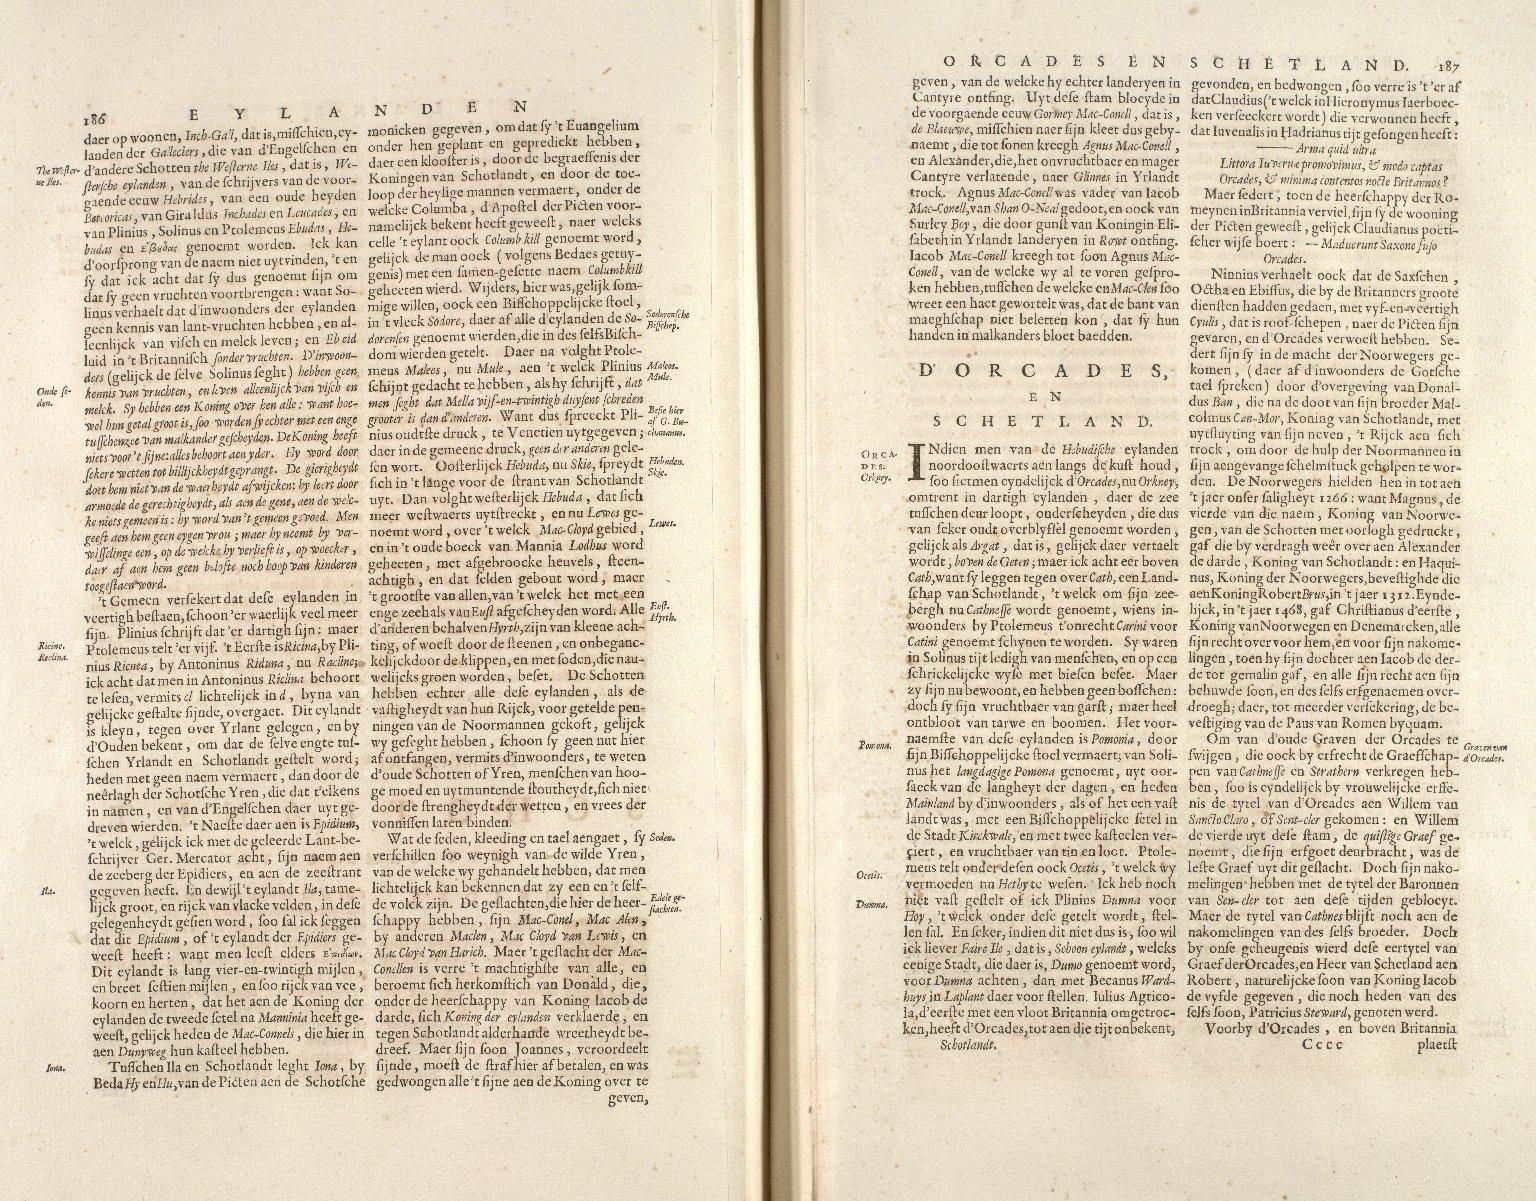 [Geographiae Blavianae] [Also known as: Atlas major] [151 of 153]